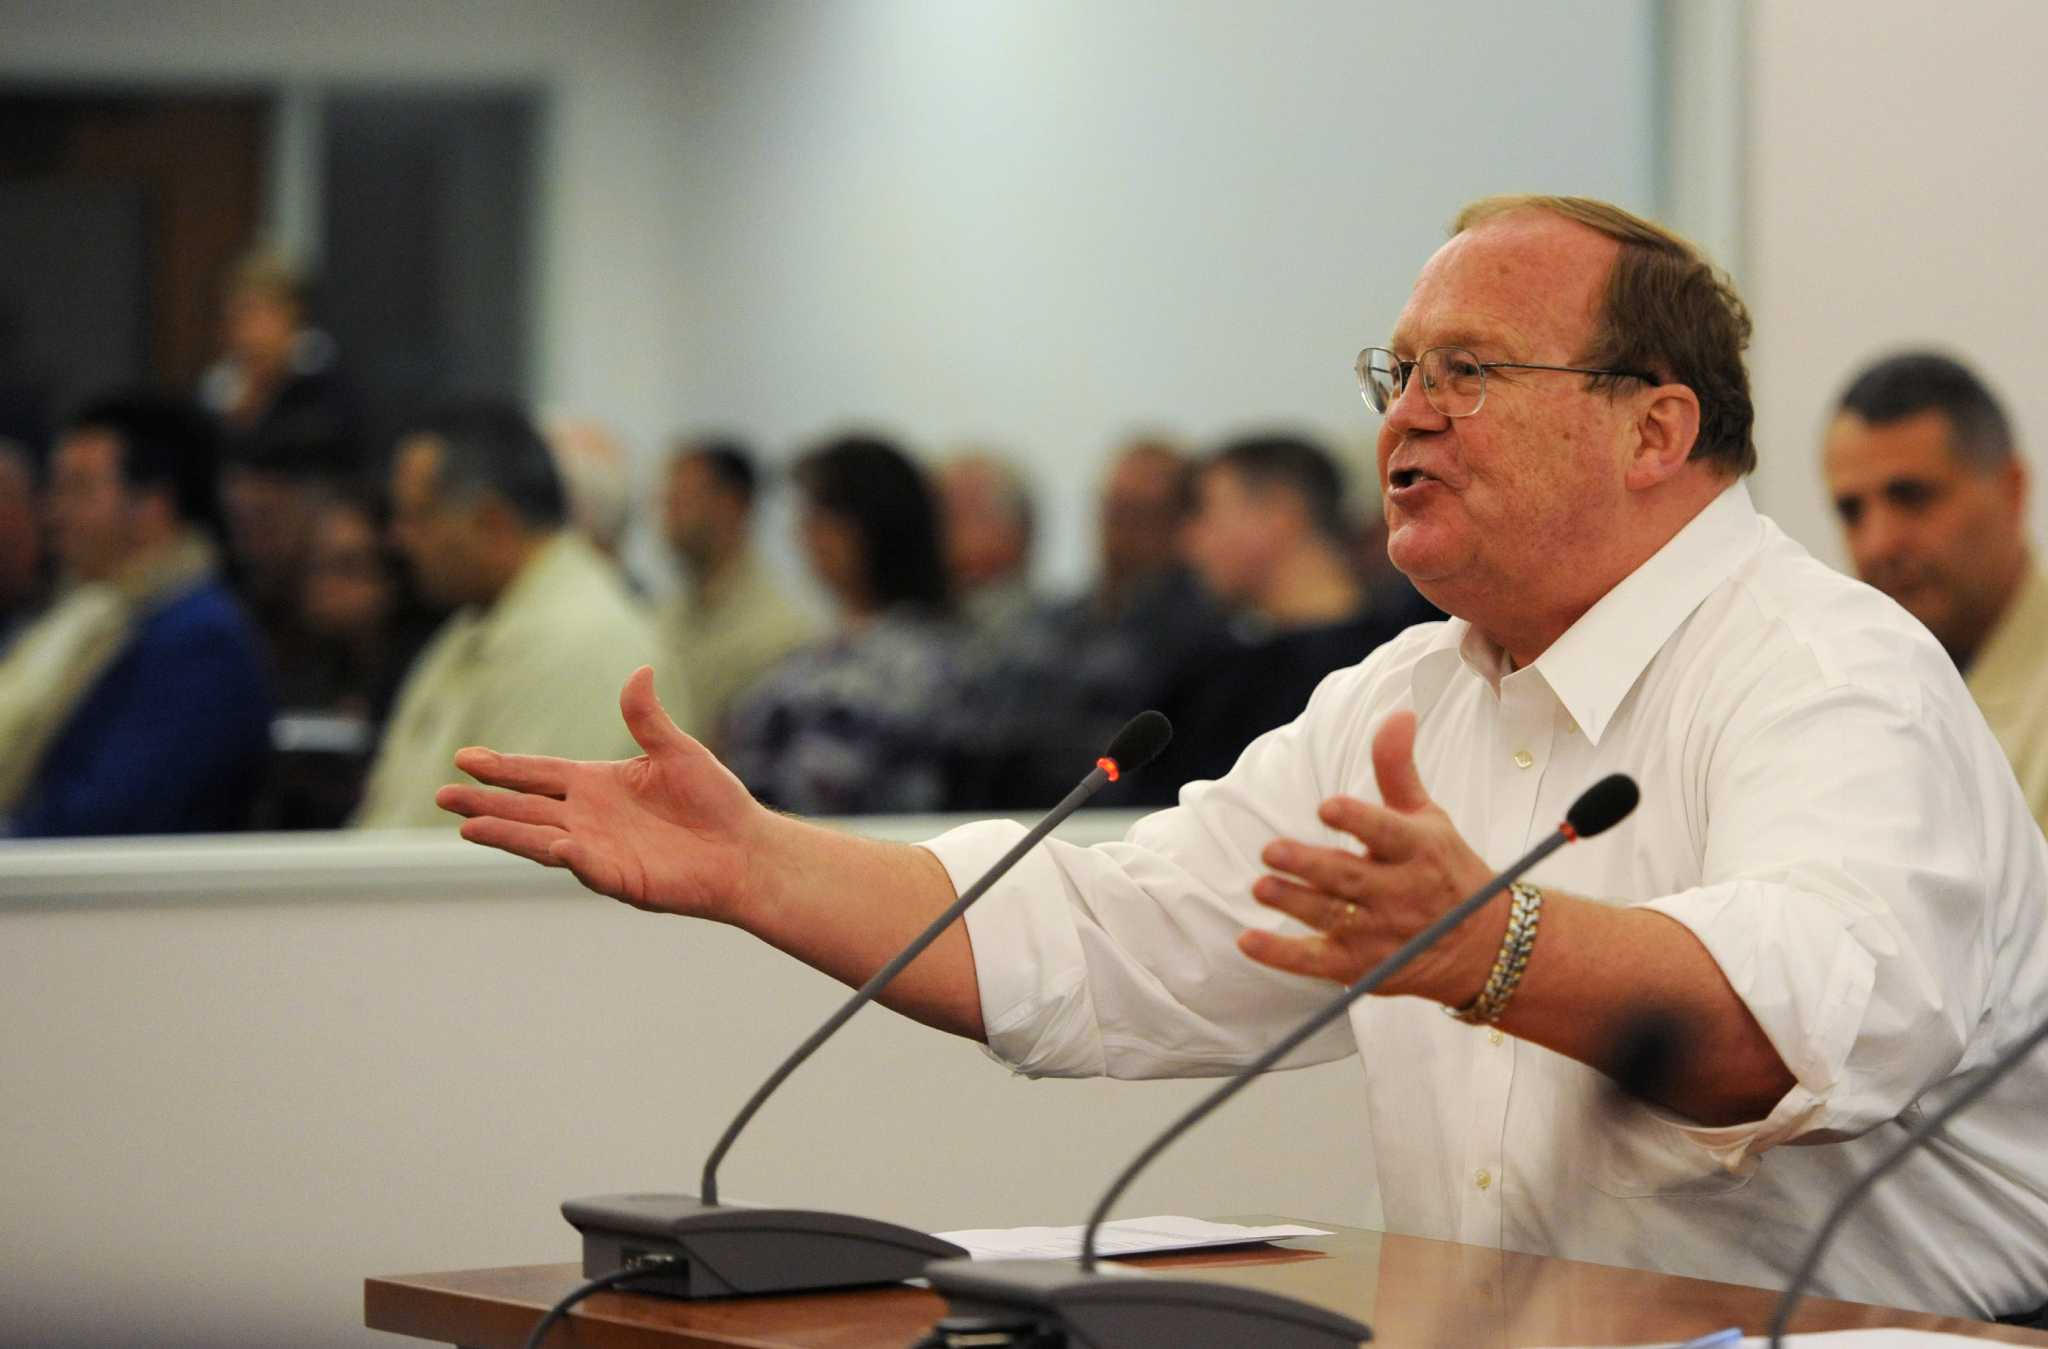 Newtown School Board Greets Sandy Hook Skeptics With Silence